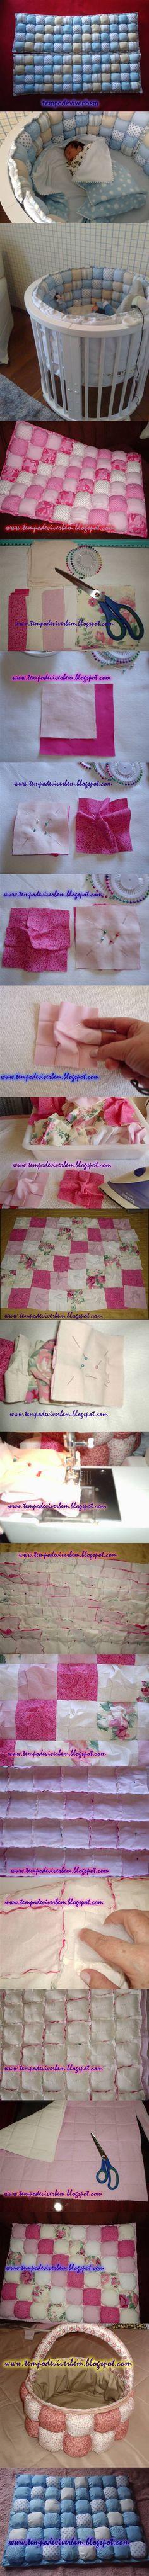 DIY Patchwork Baby Sleeping Basket Bumper | iCreativeIdeas.com Follow Us on Facebook --> https://www.facebook.com/icreativeideas